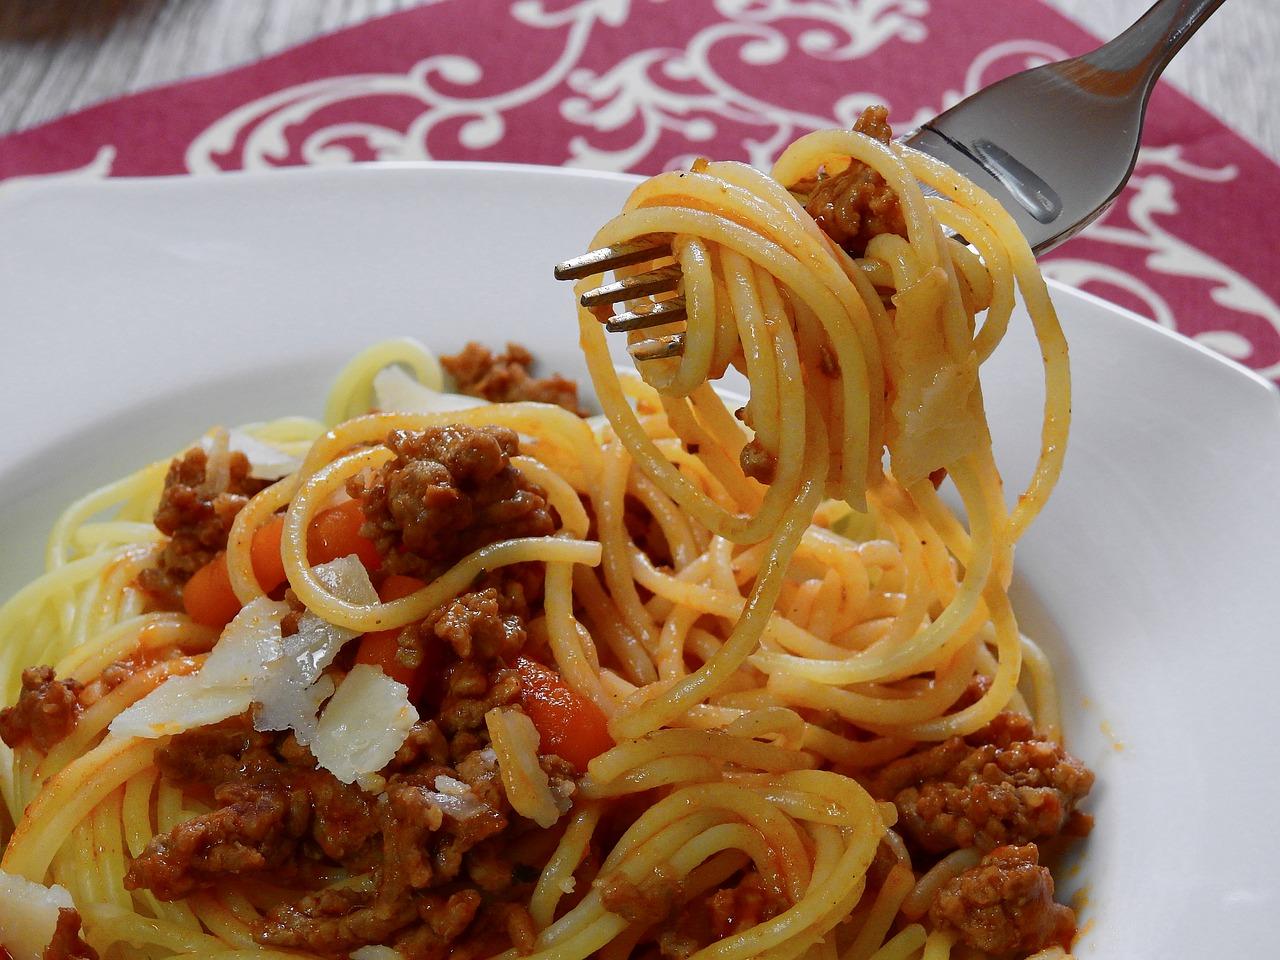 Spaghetti aus Kichererbsenmehl